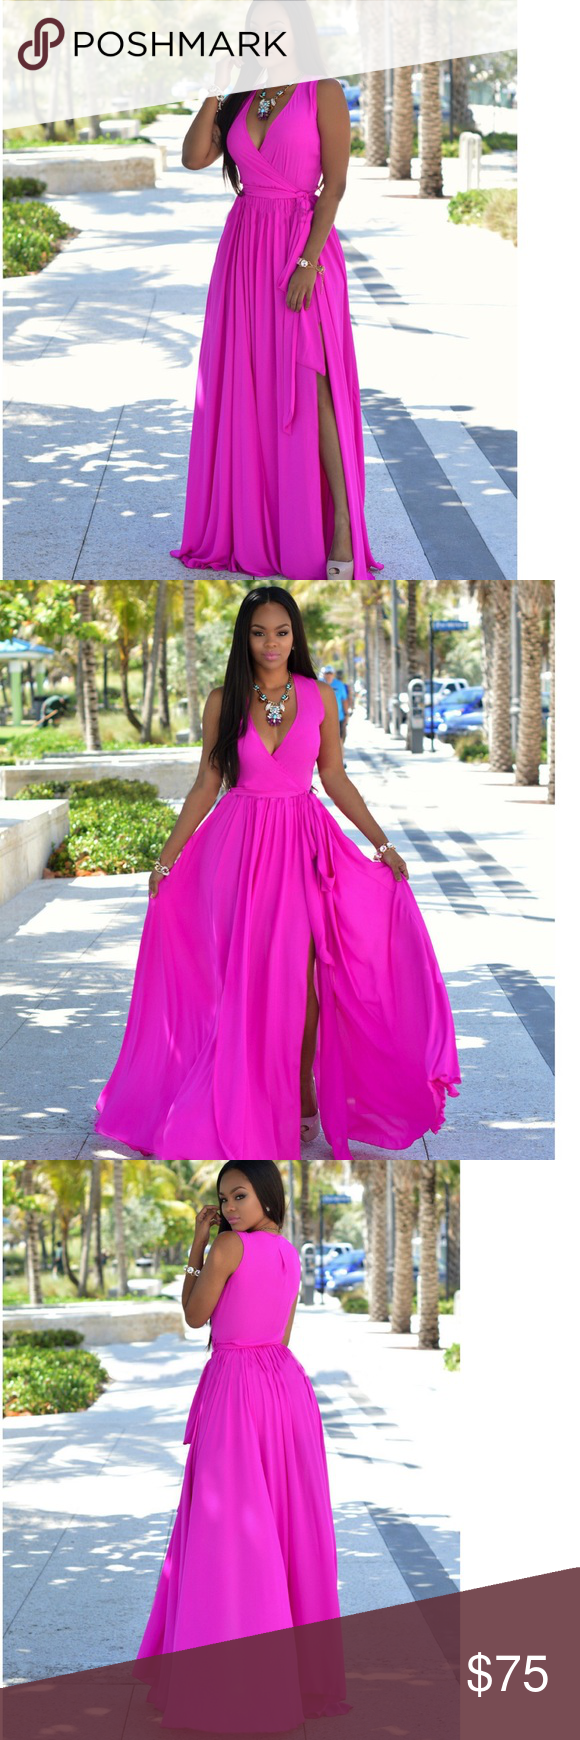 Arwen Goes to Prom Jessica McClintock Dress Beautiful ...